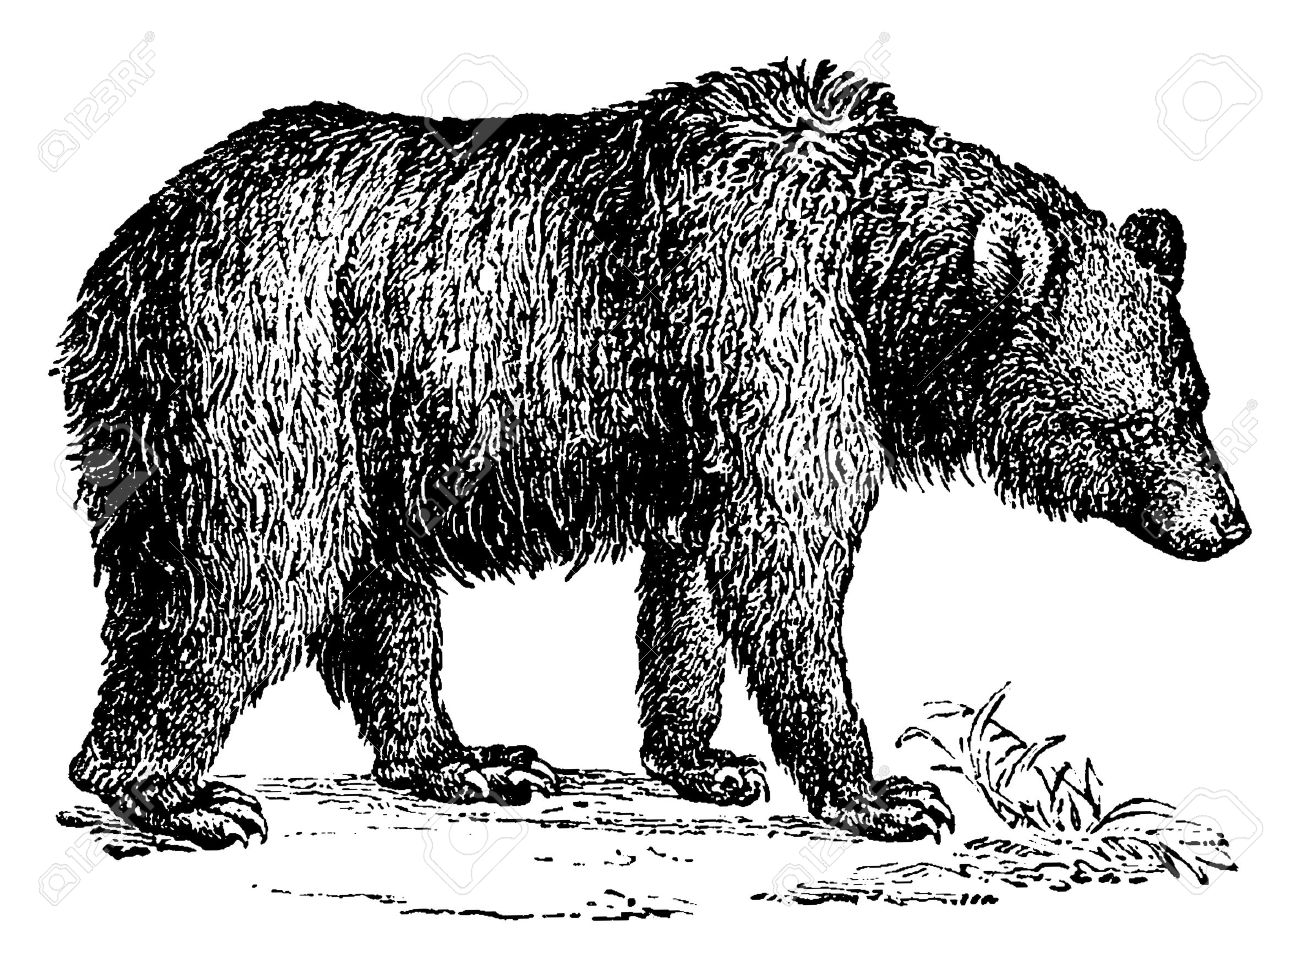 Brown bear, vintage engraved illustration. Natural History of Animals, 1880. - 41776618